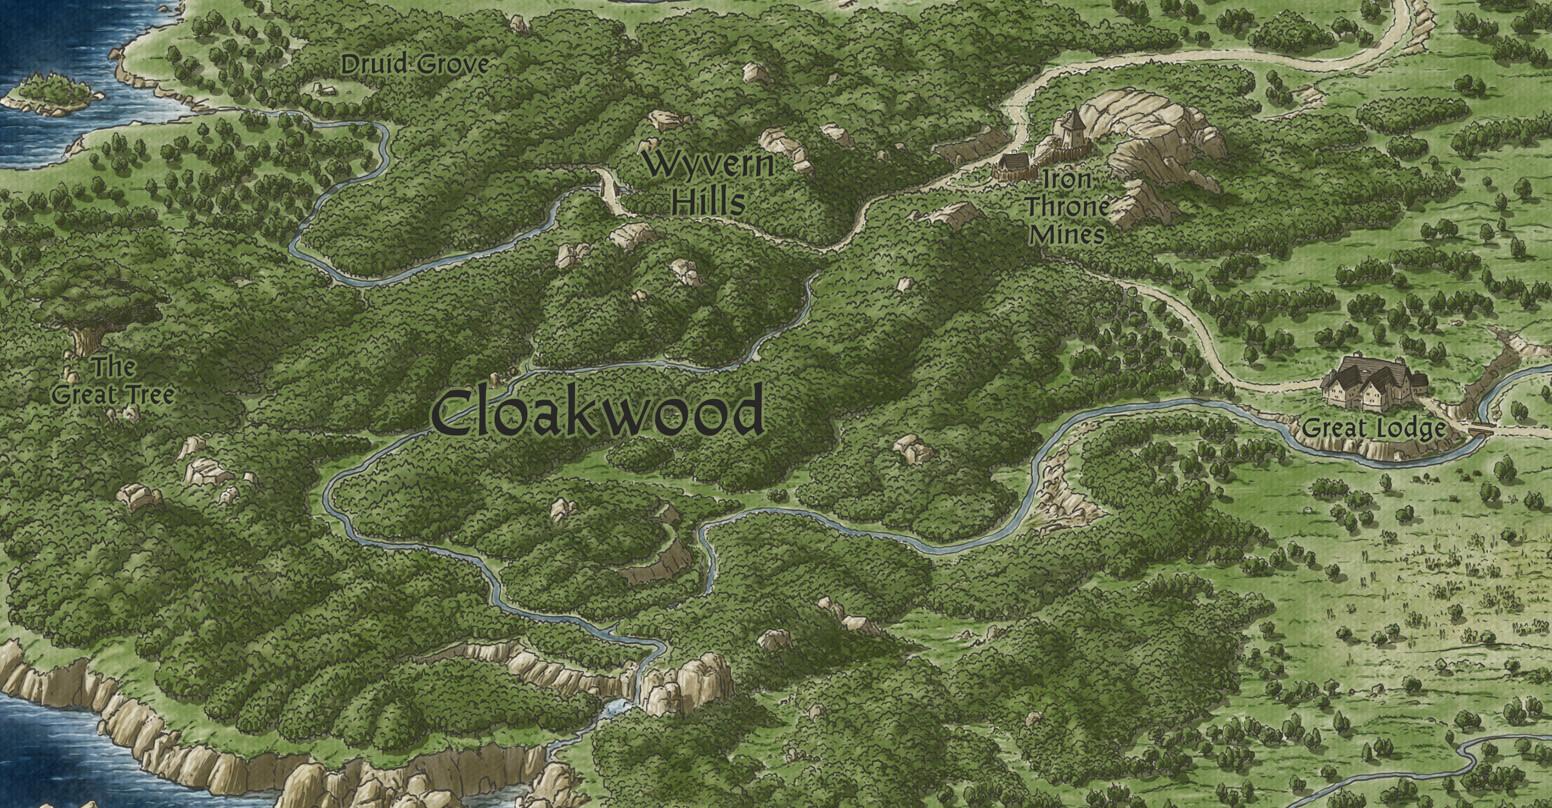 ArtStation - Baldur's Gate - Sword Coast map, John Stevenson